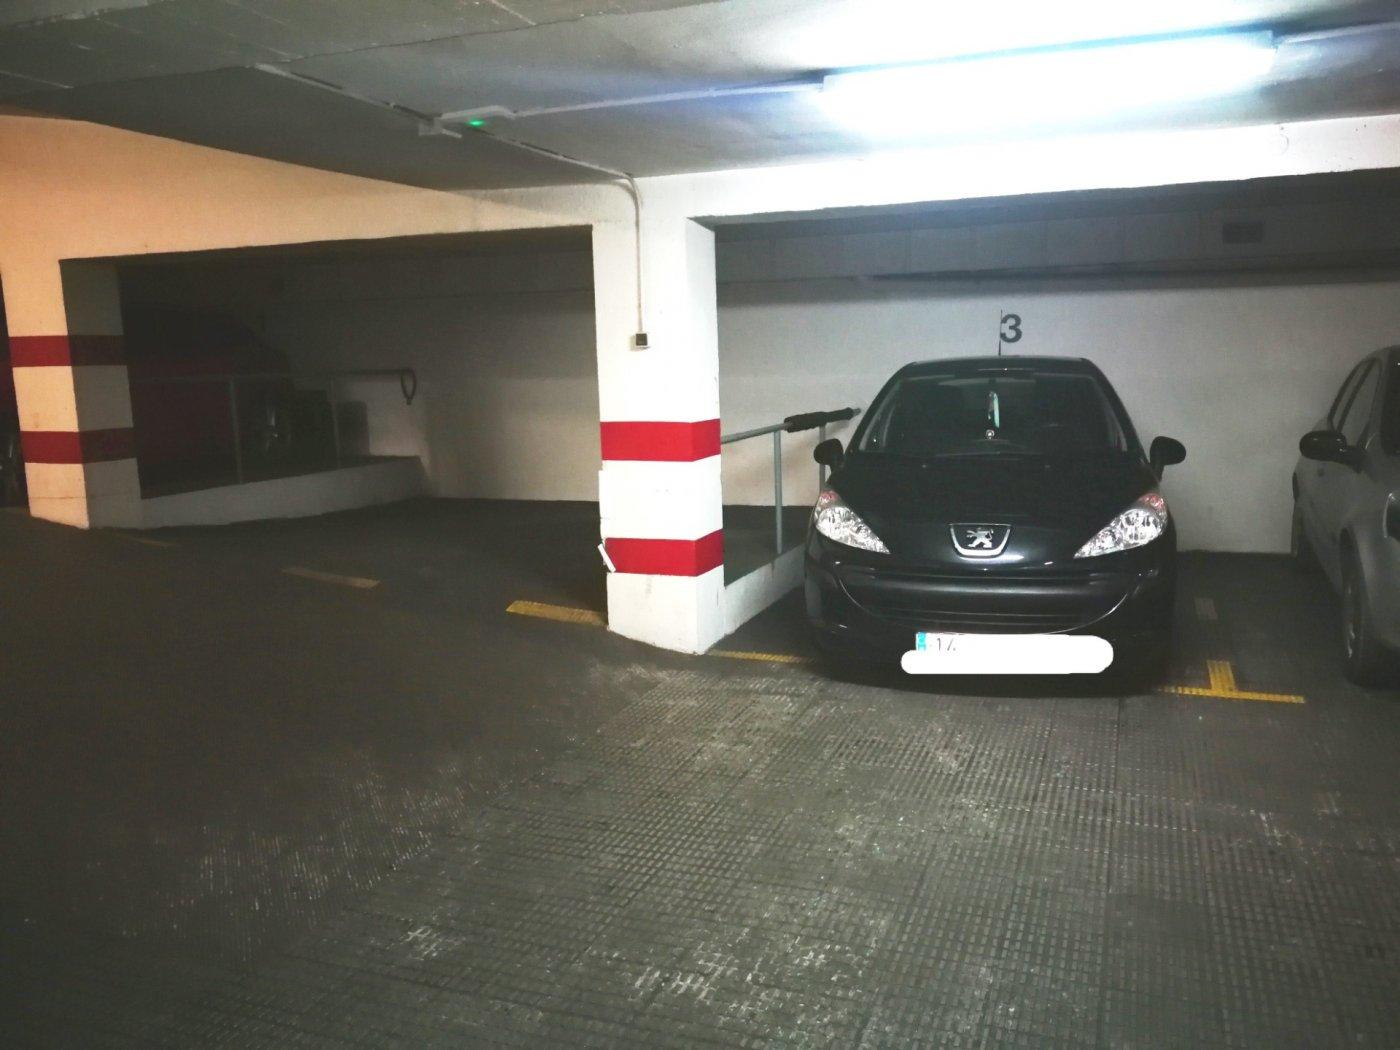 Vendo plaza garaje calle fita - imagenInmueble4